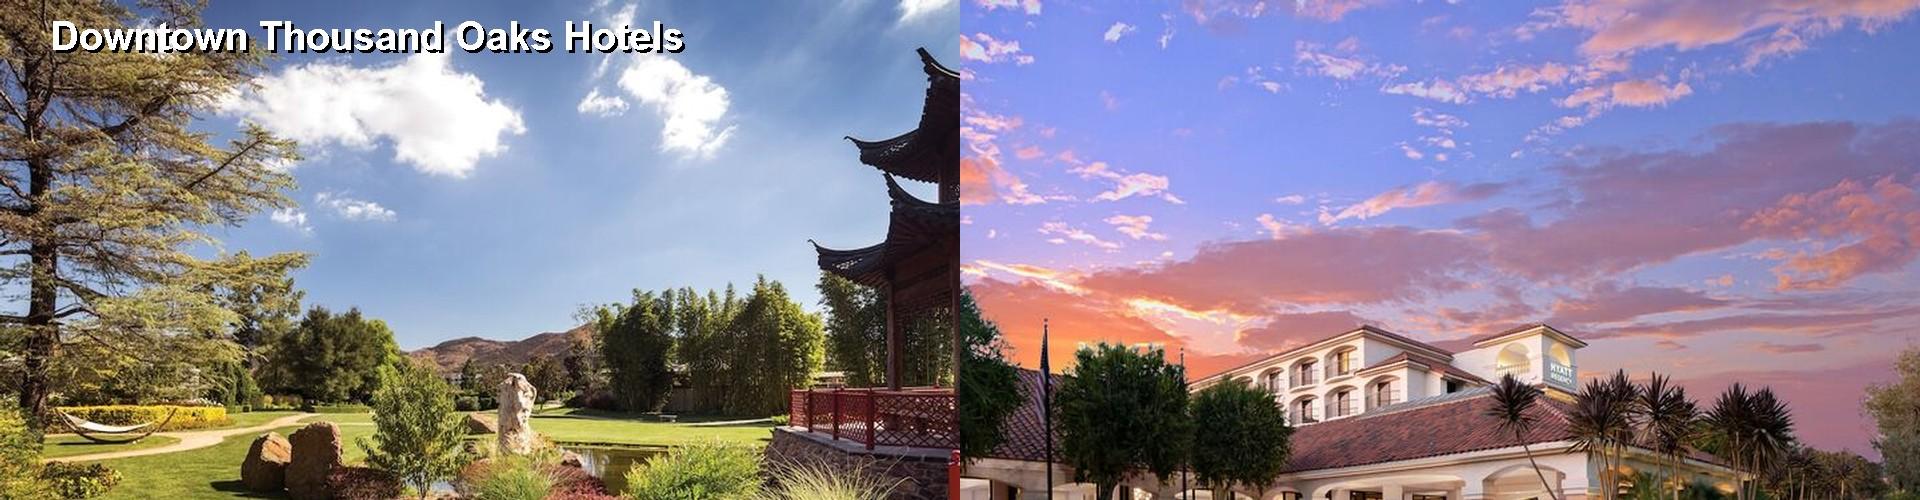 5 Best Hotels Near Downtown Thousand Oaks